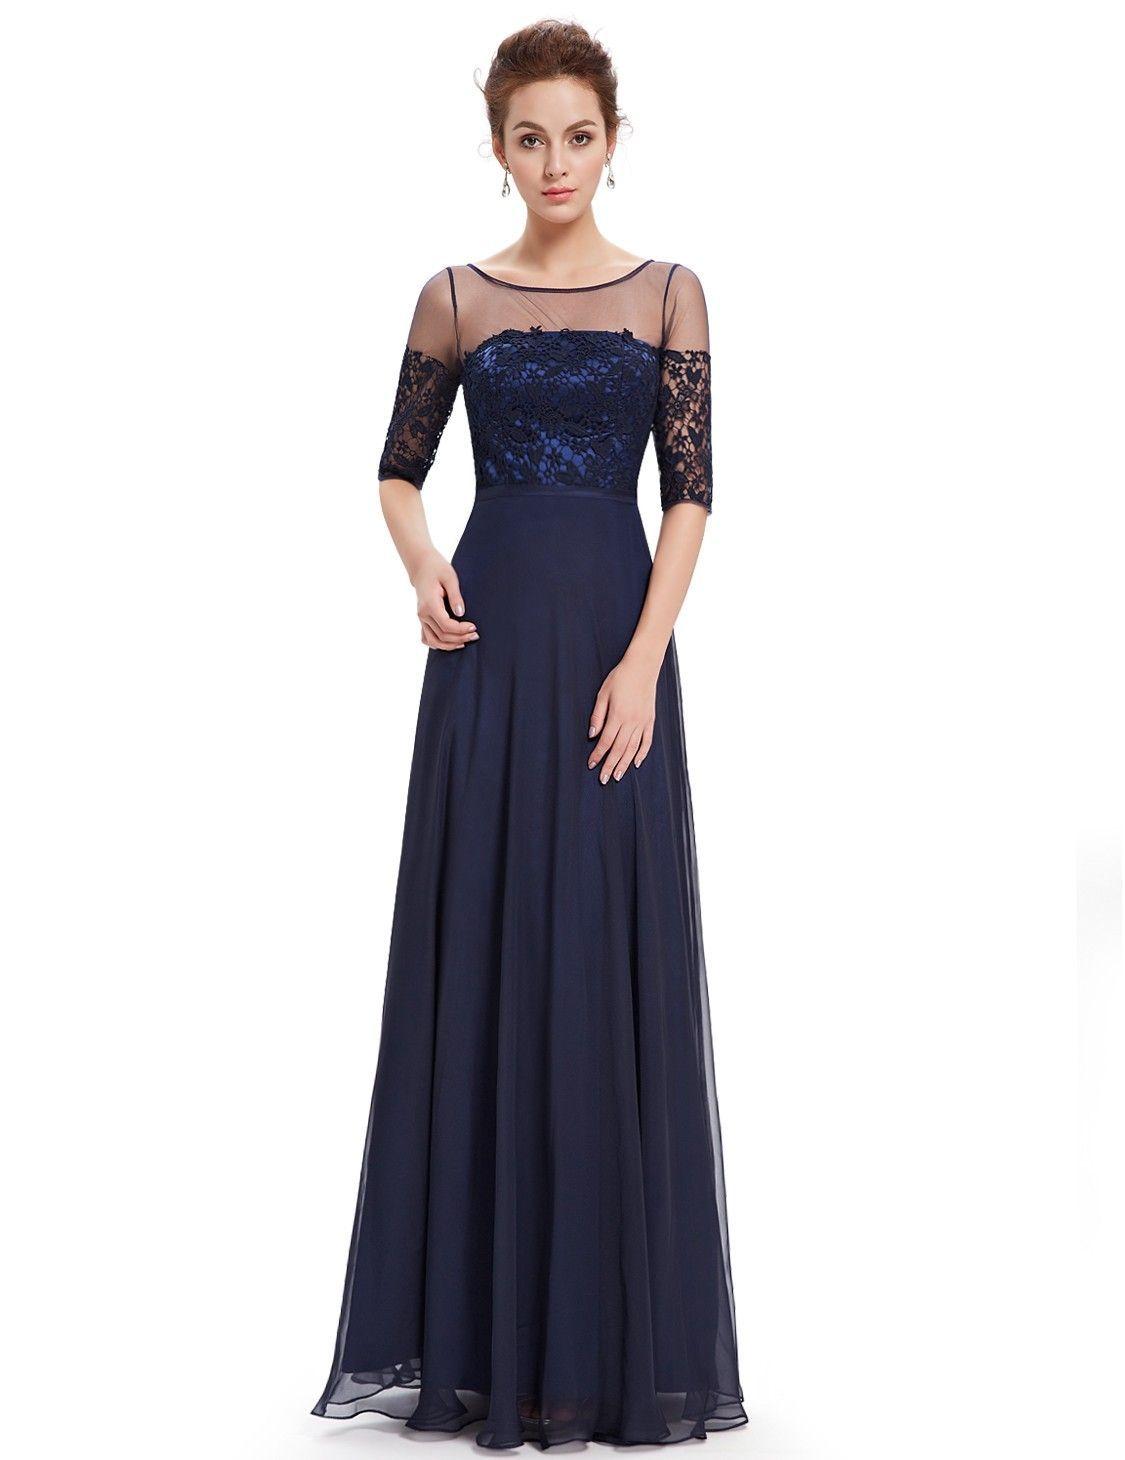 Halbarm Abendkleid Dunkelblau A-Linie #mode #damenmode #fashion